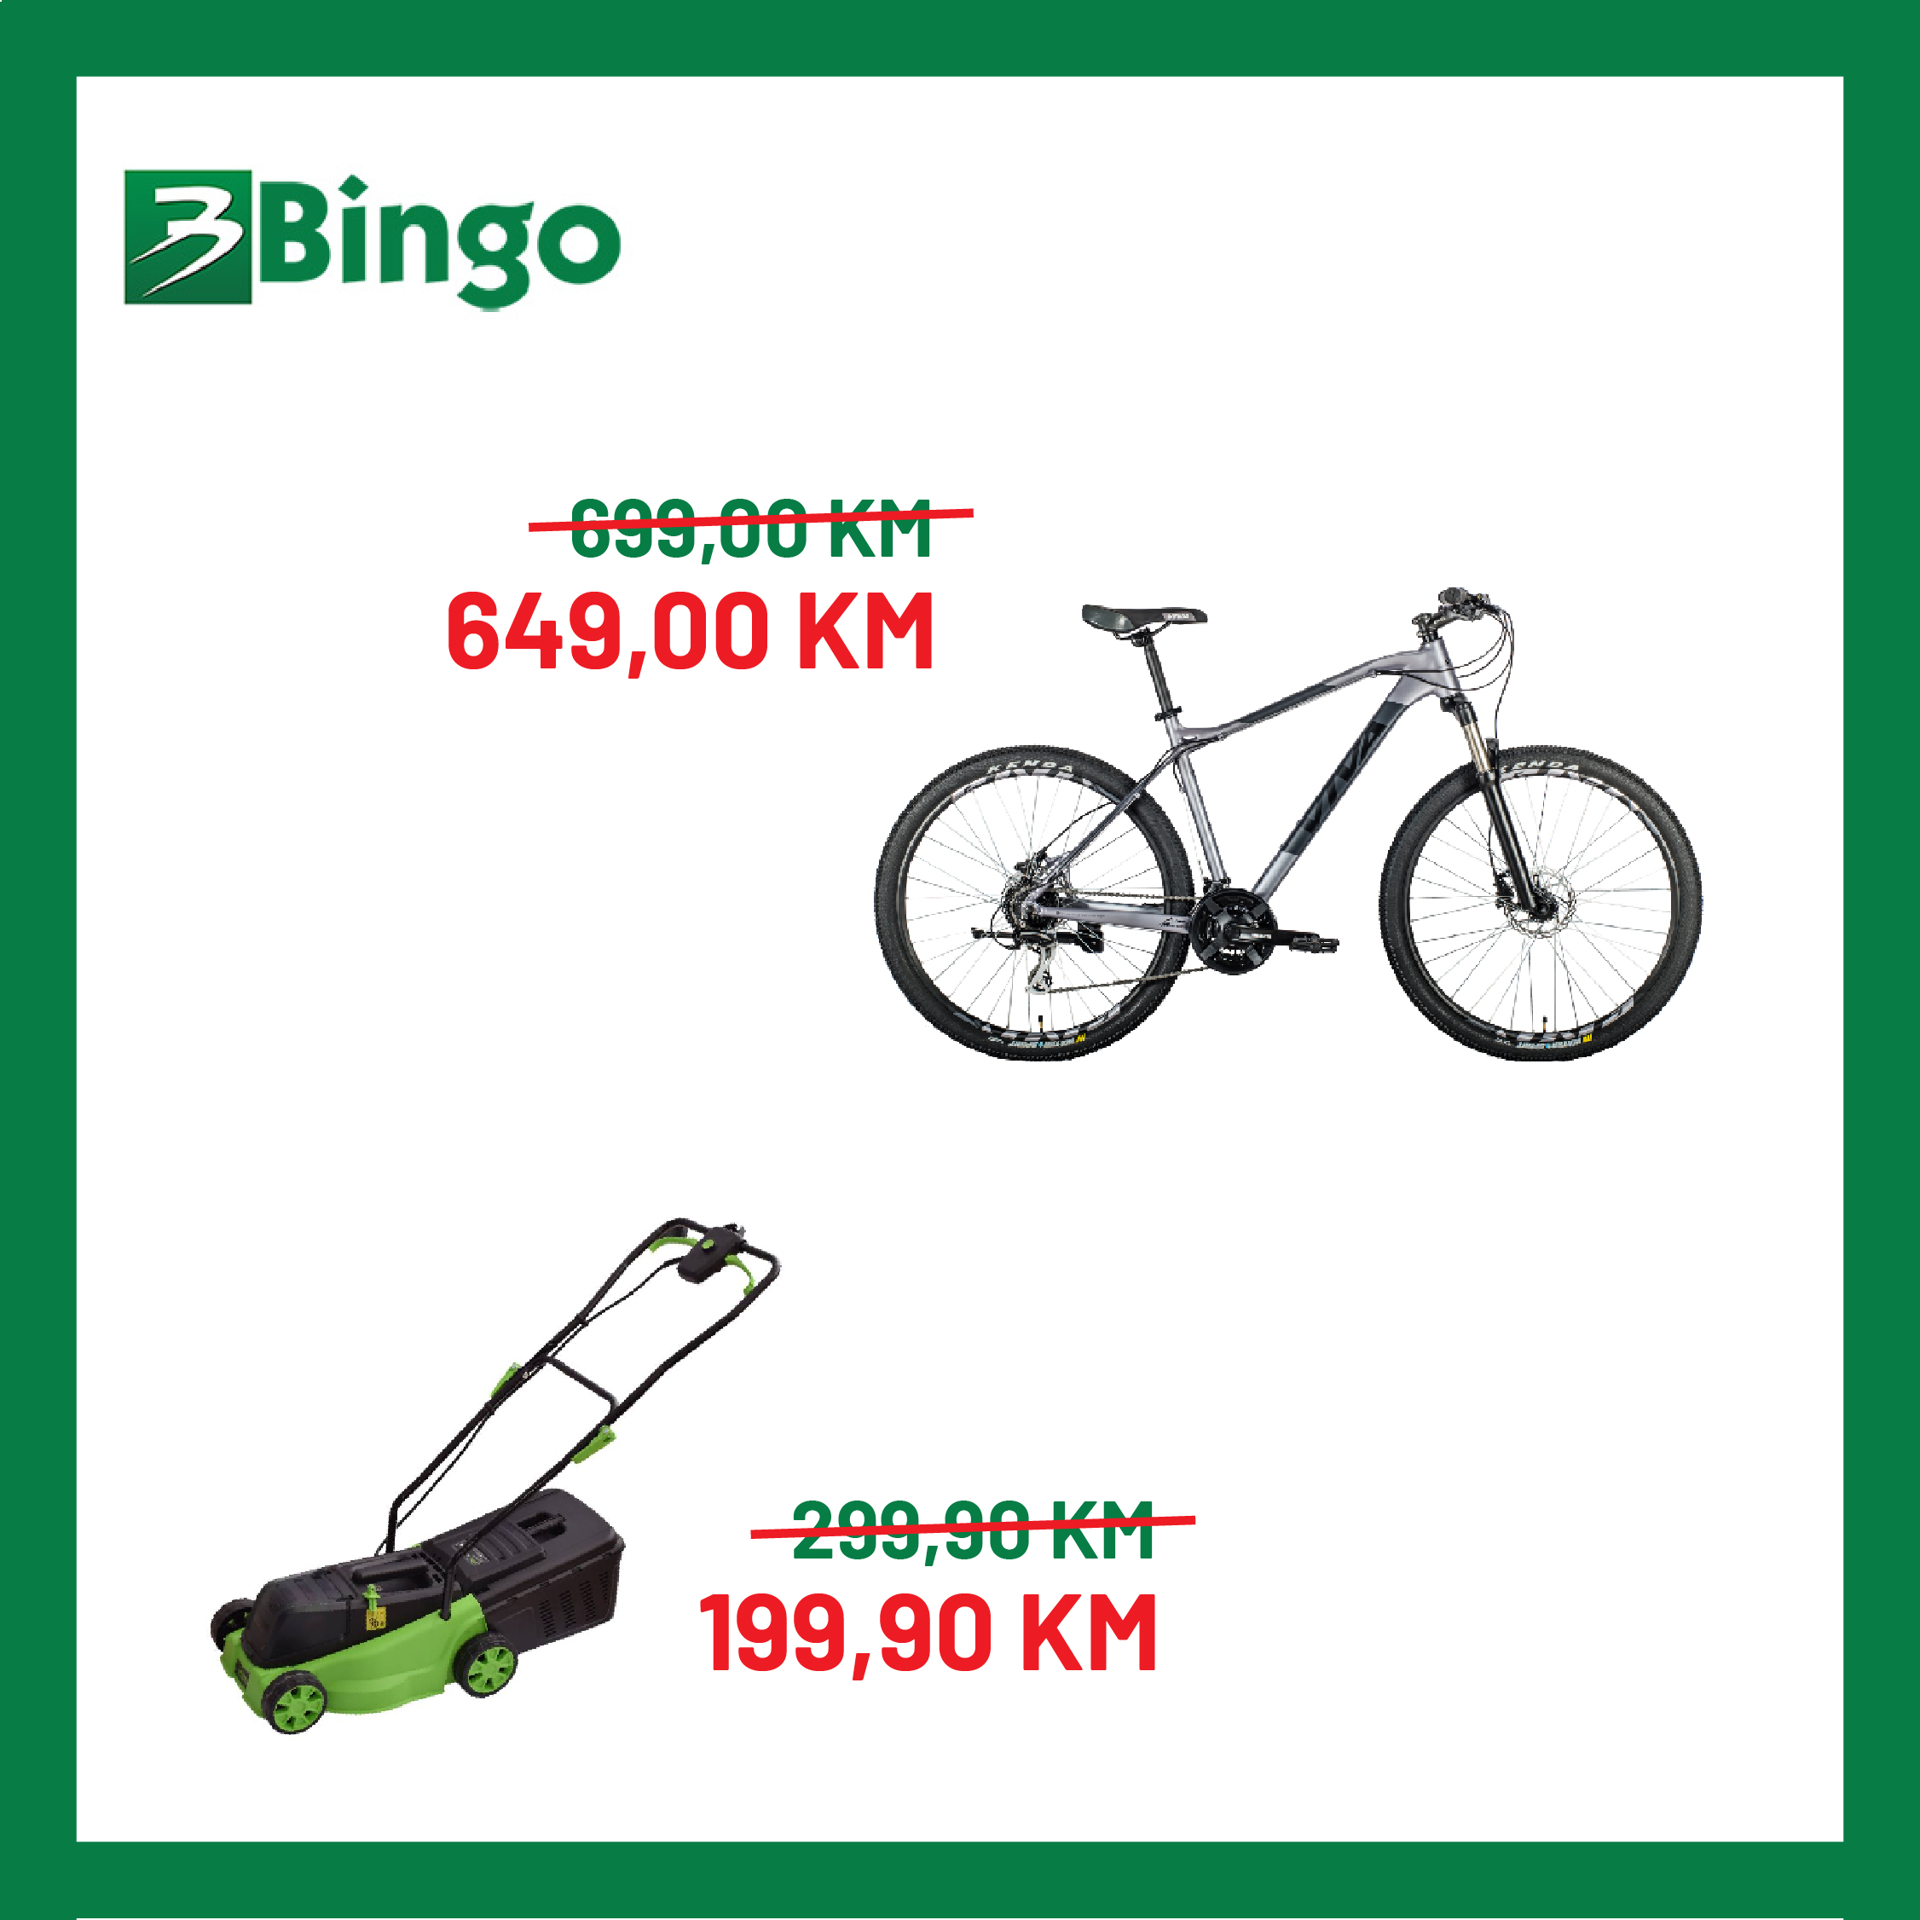 BINGO Katalog Super akcija JUL 2021 12.7.2021. 14.7.2021 2